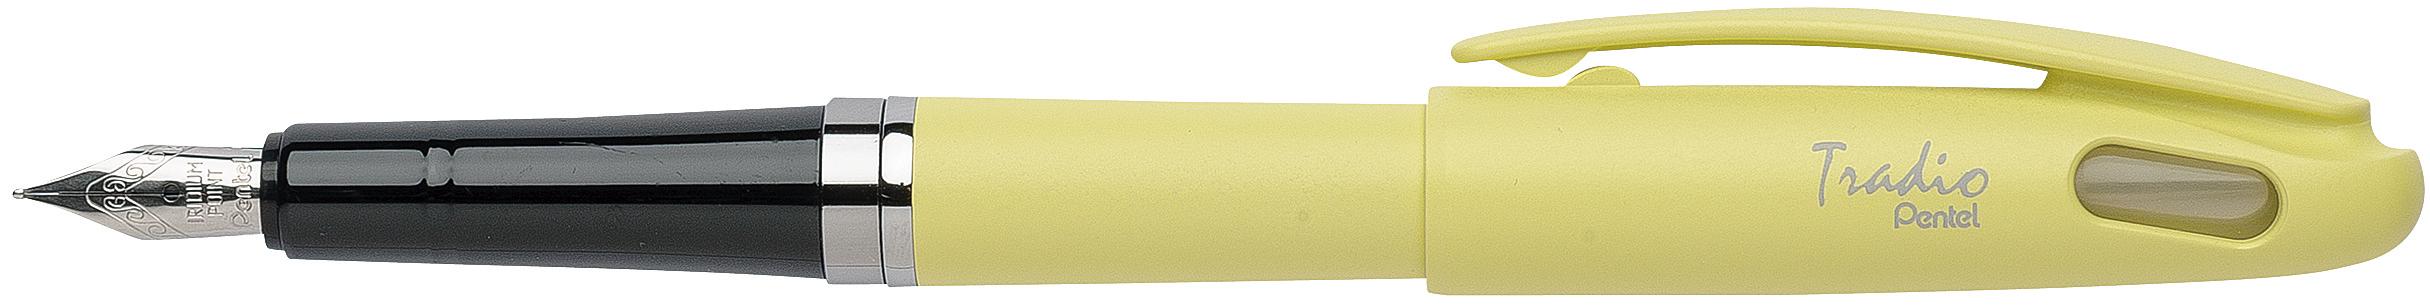 Pentel Tradio Pastel - Stylo plume - corps jaune